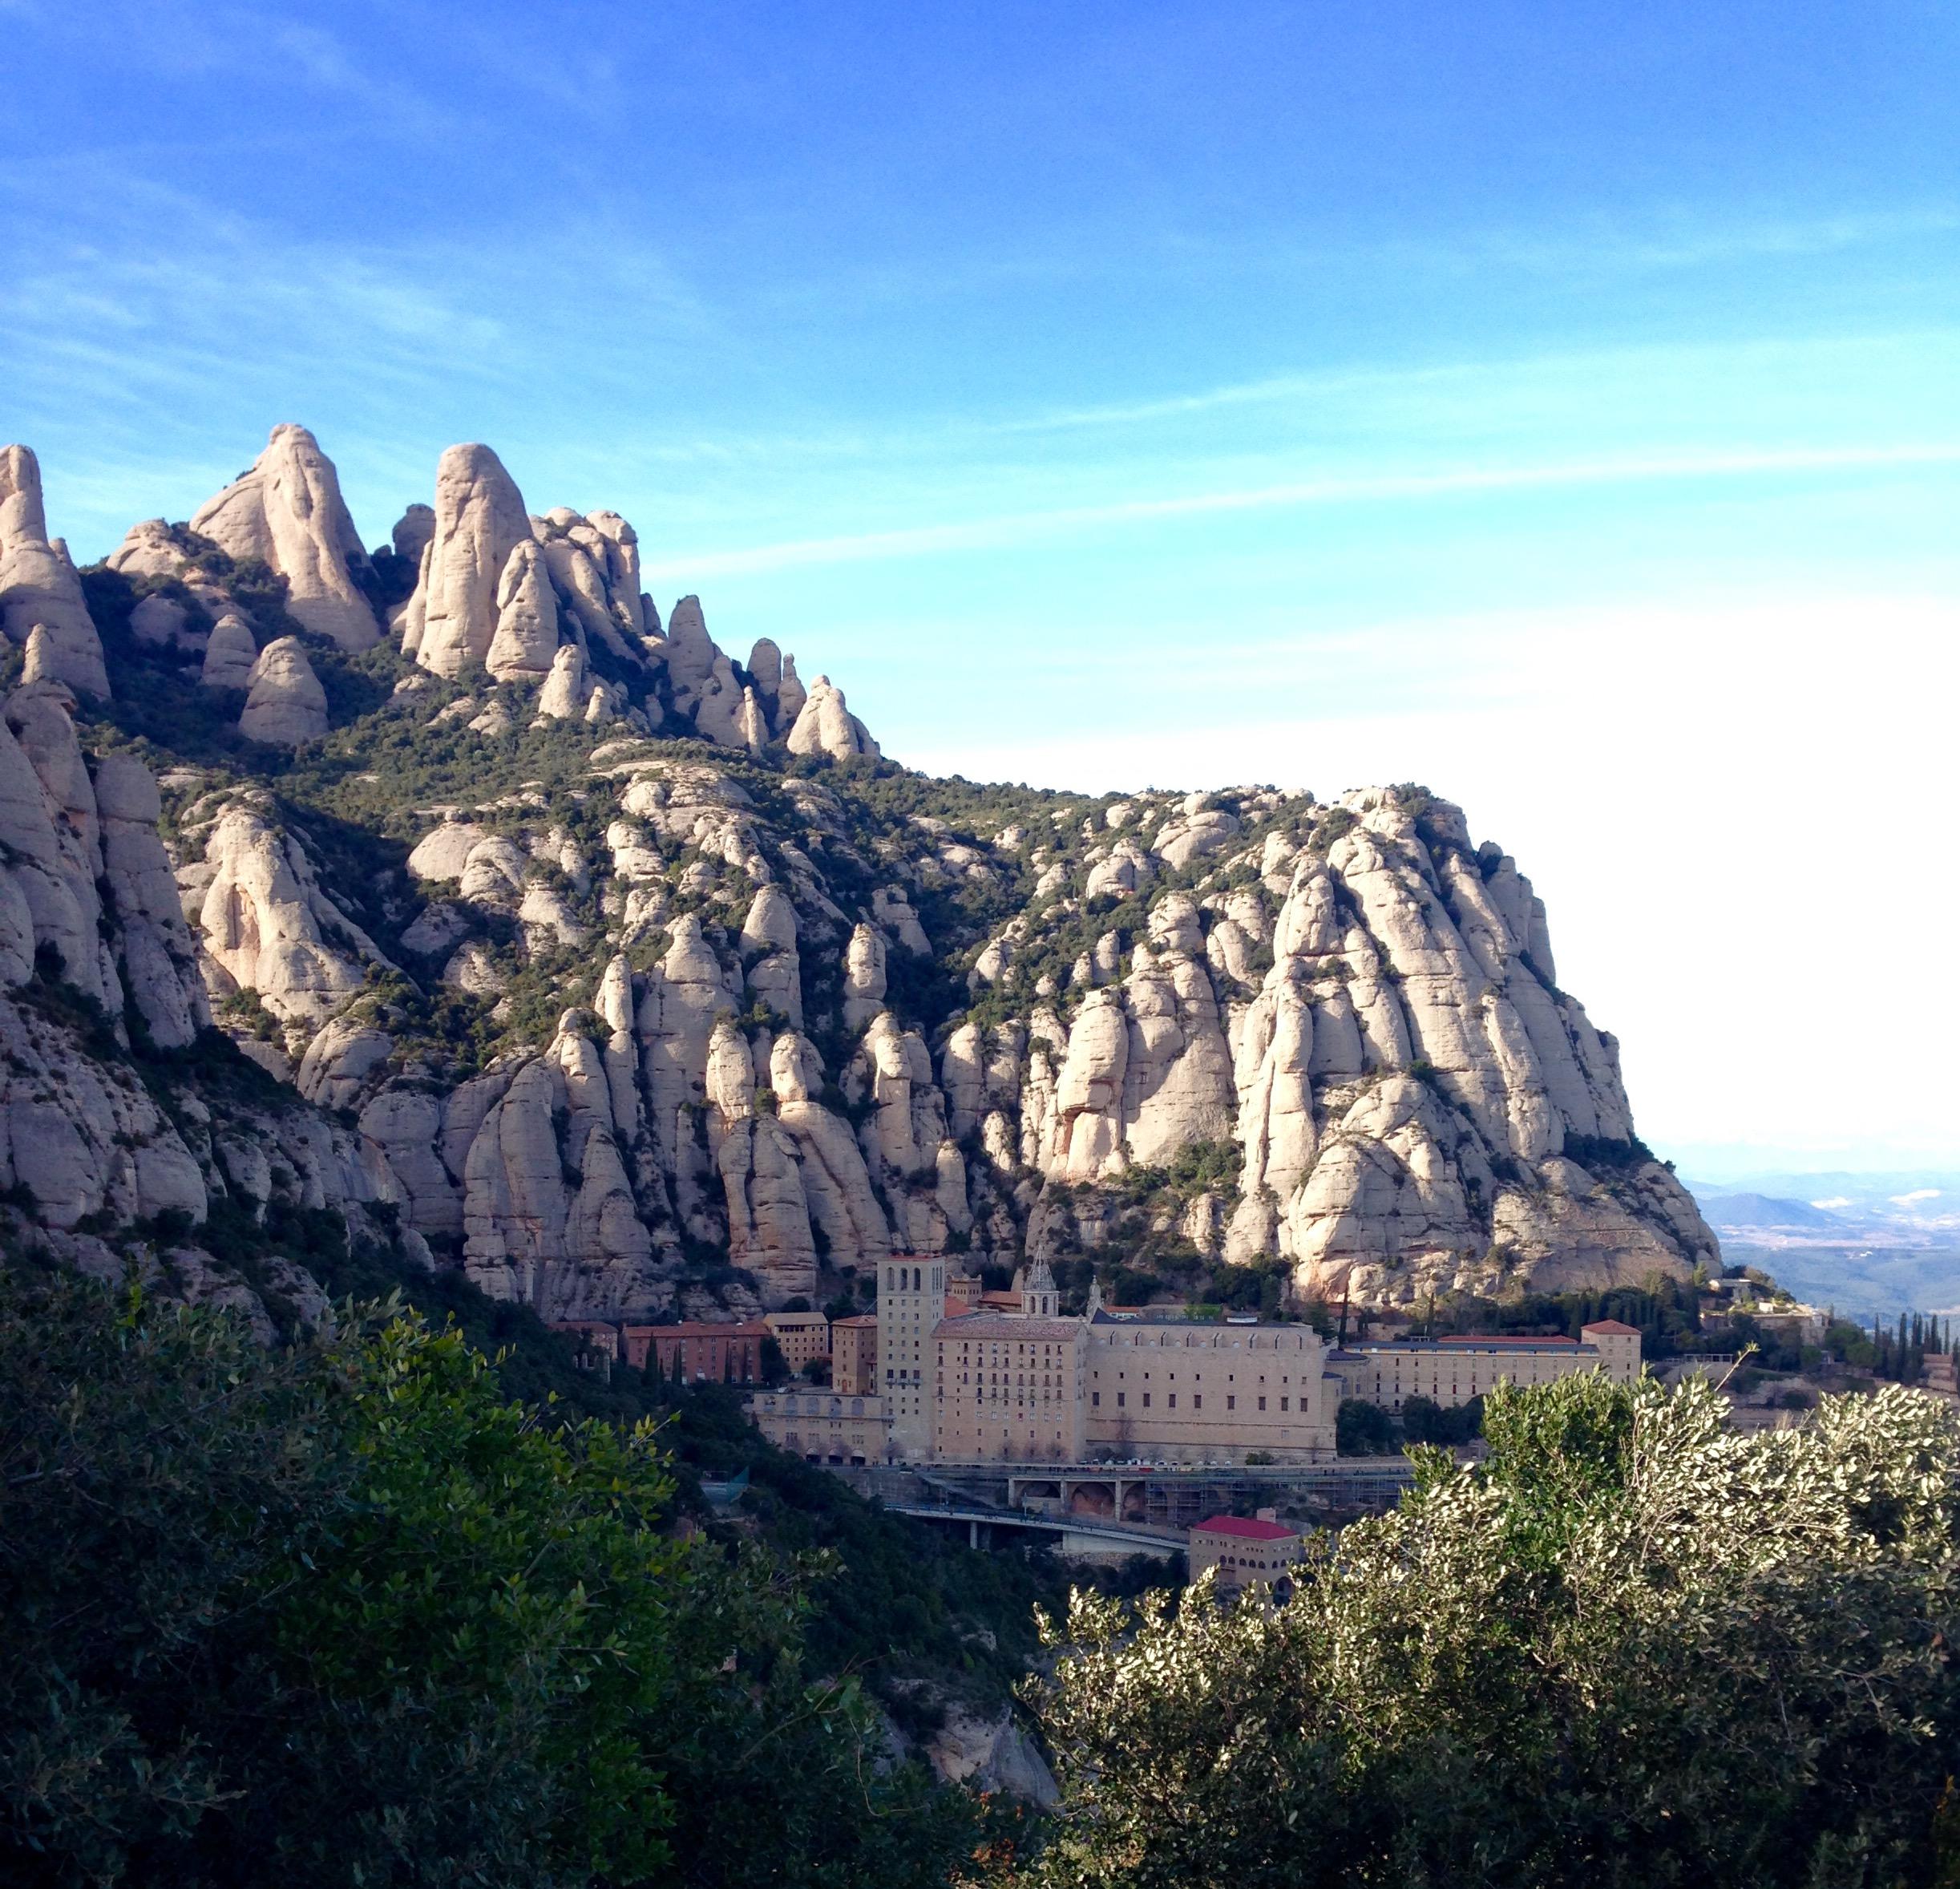 Montserrat from St. Michael's cross